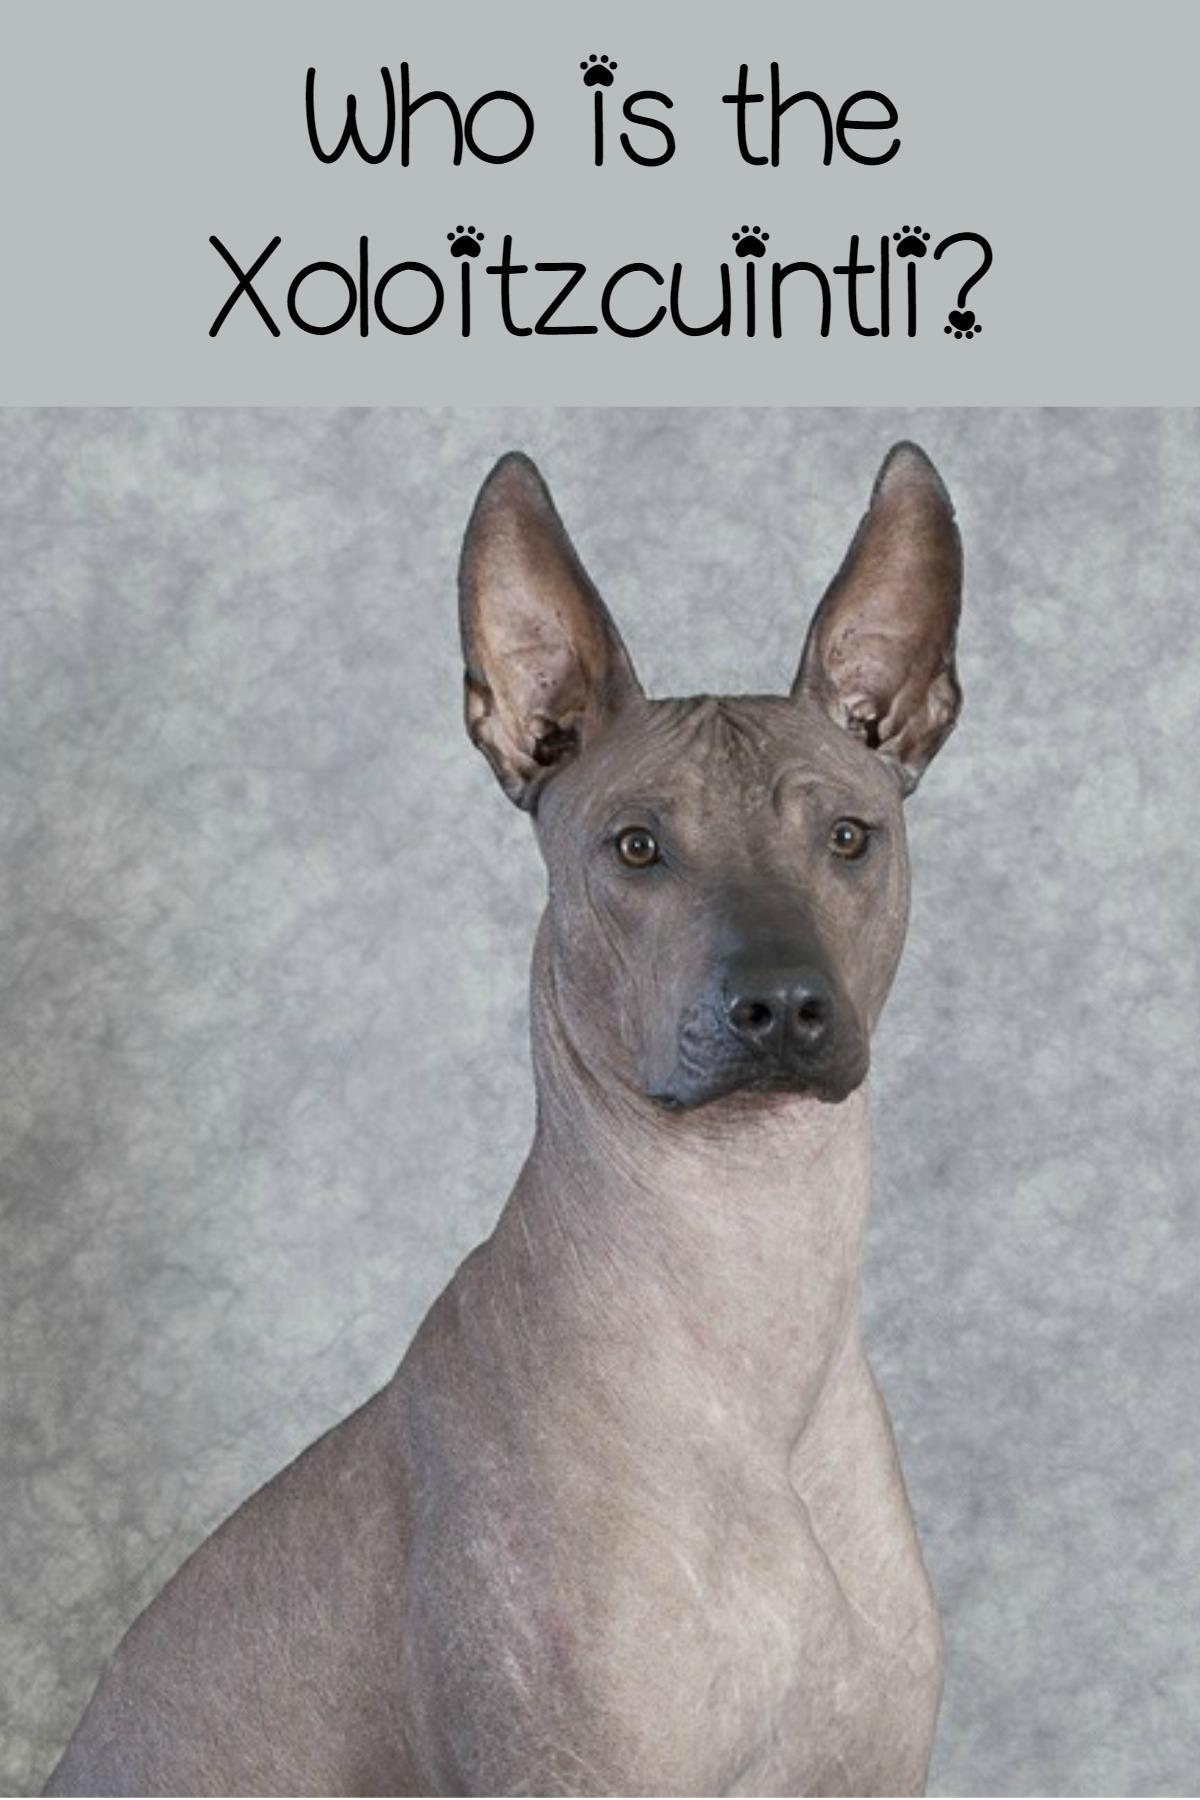 The Xoloitzcuintli - A Unique Hypoallergenic Dog - DogVills